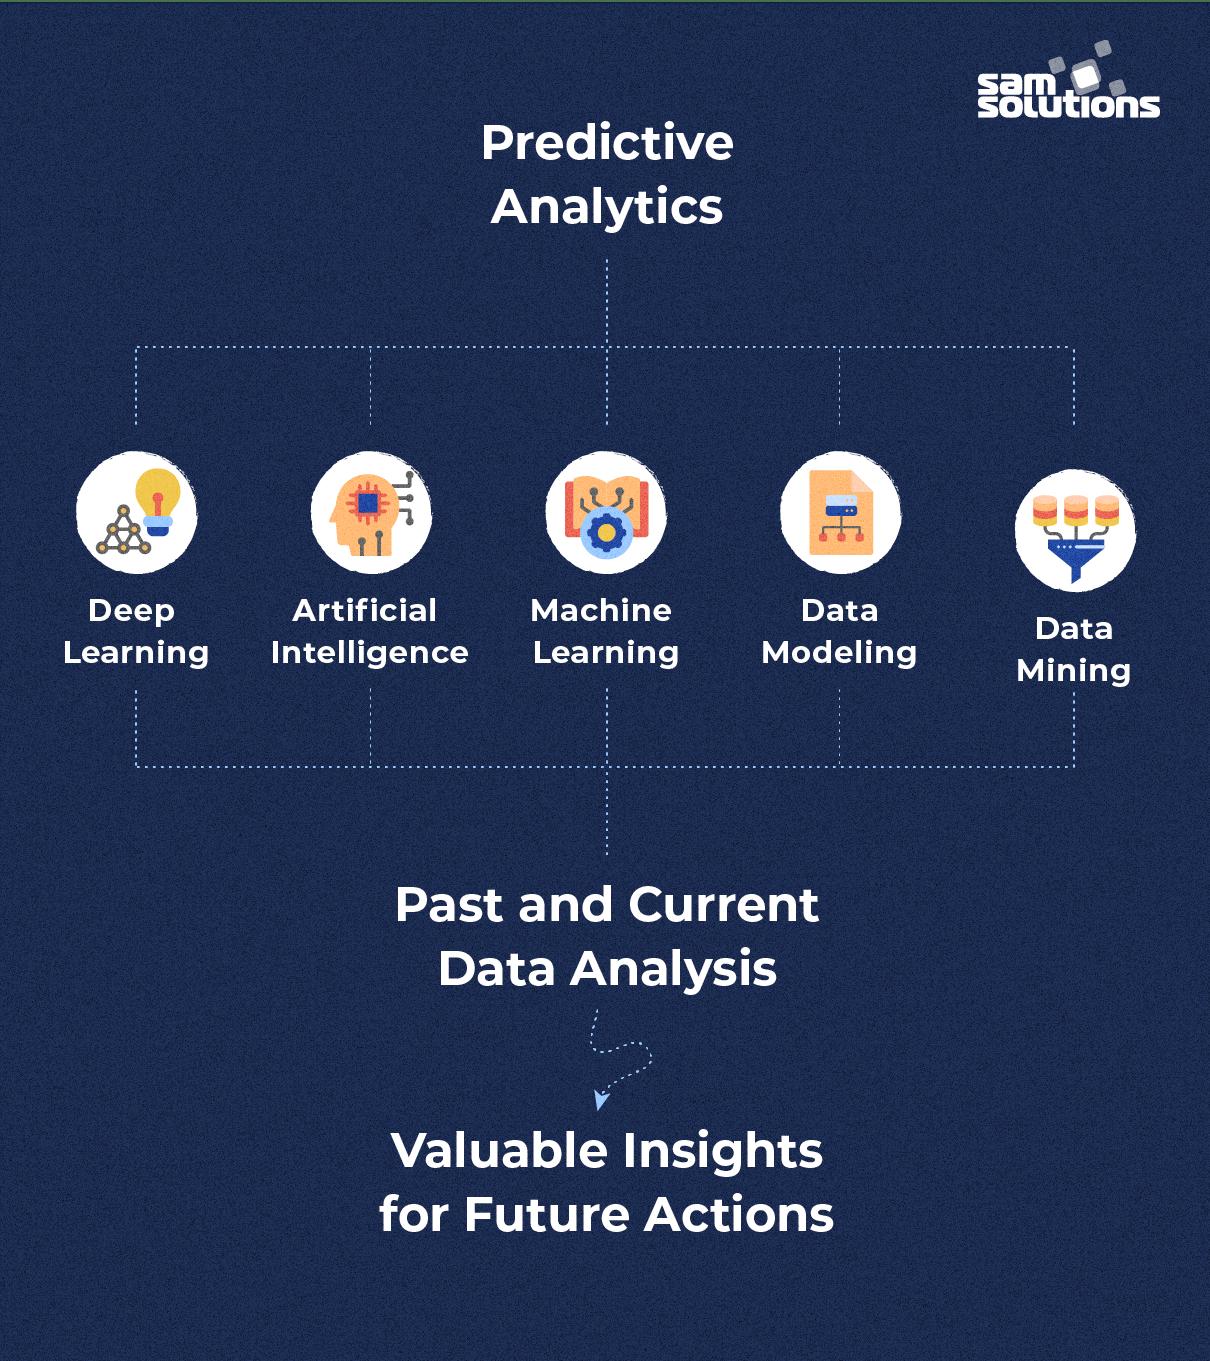 Predictive-analytics-what-is-it